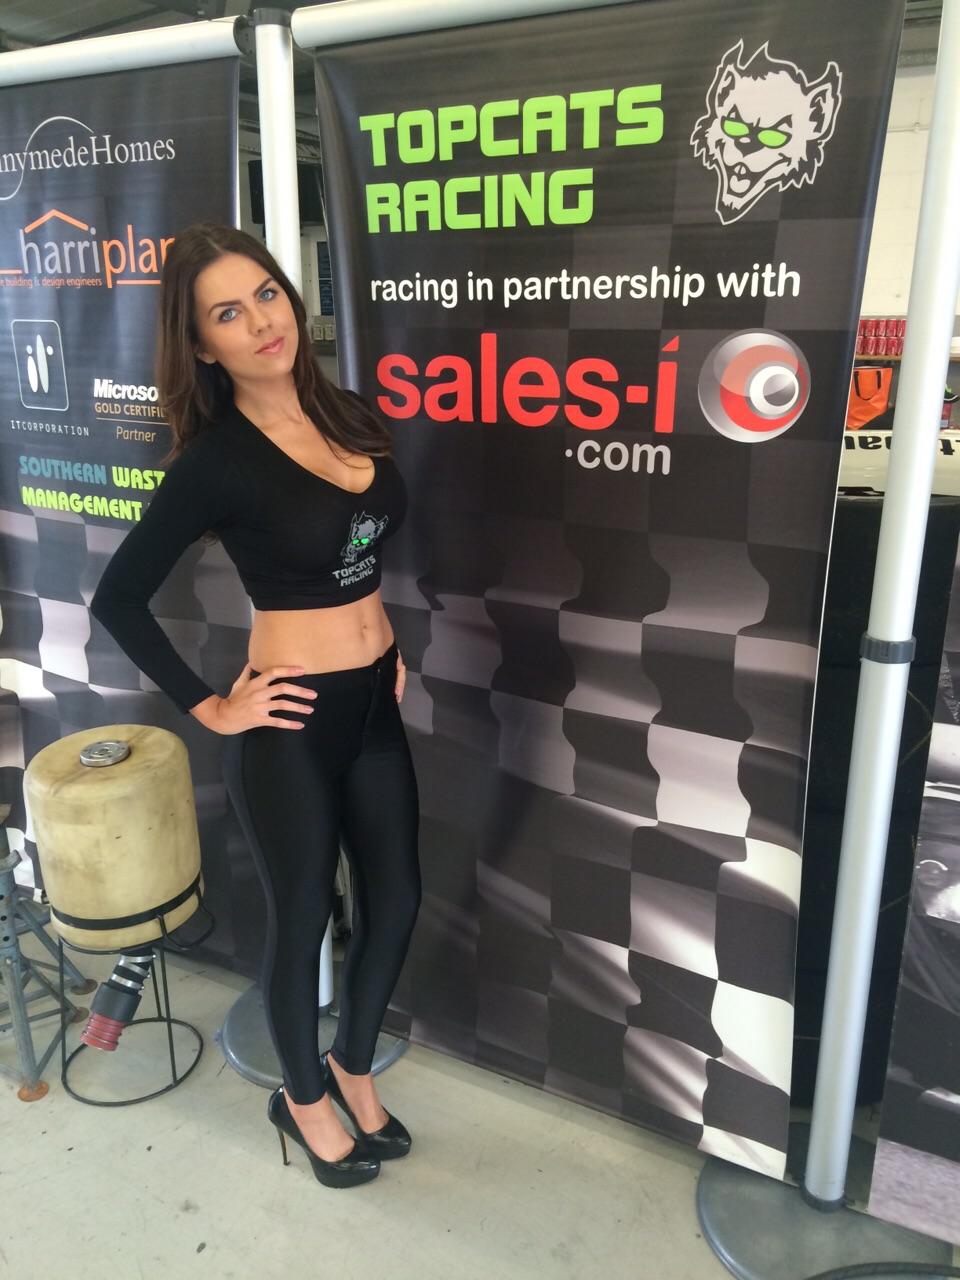 Topcats Racing – BritCar 24hr